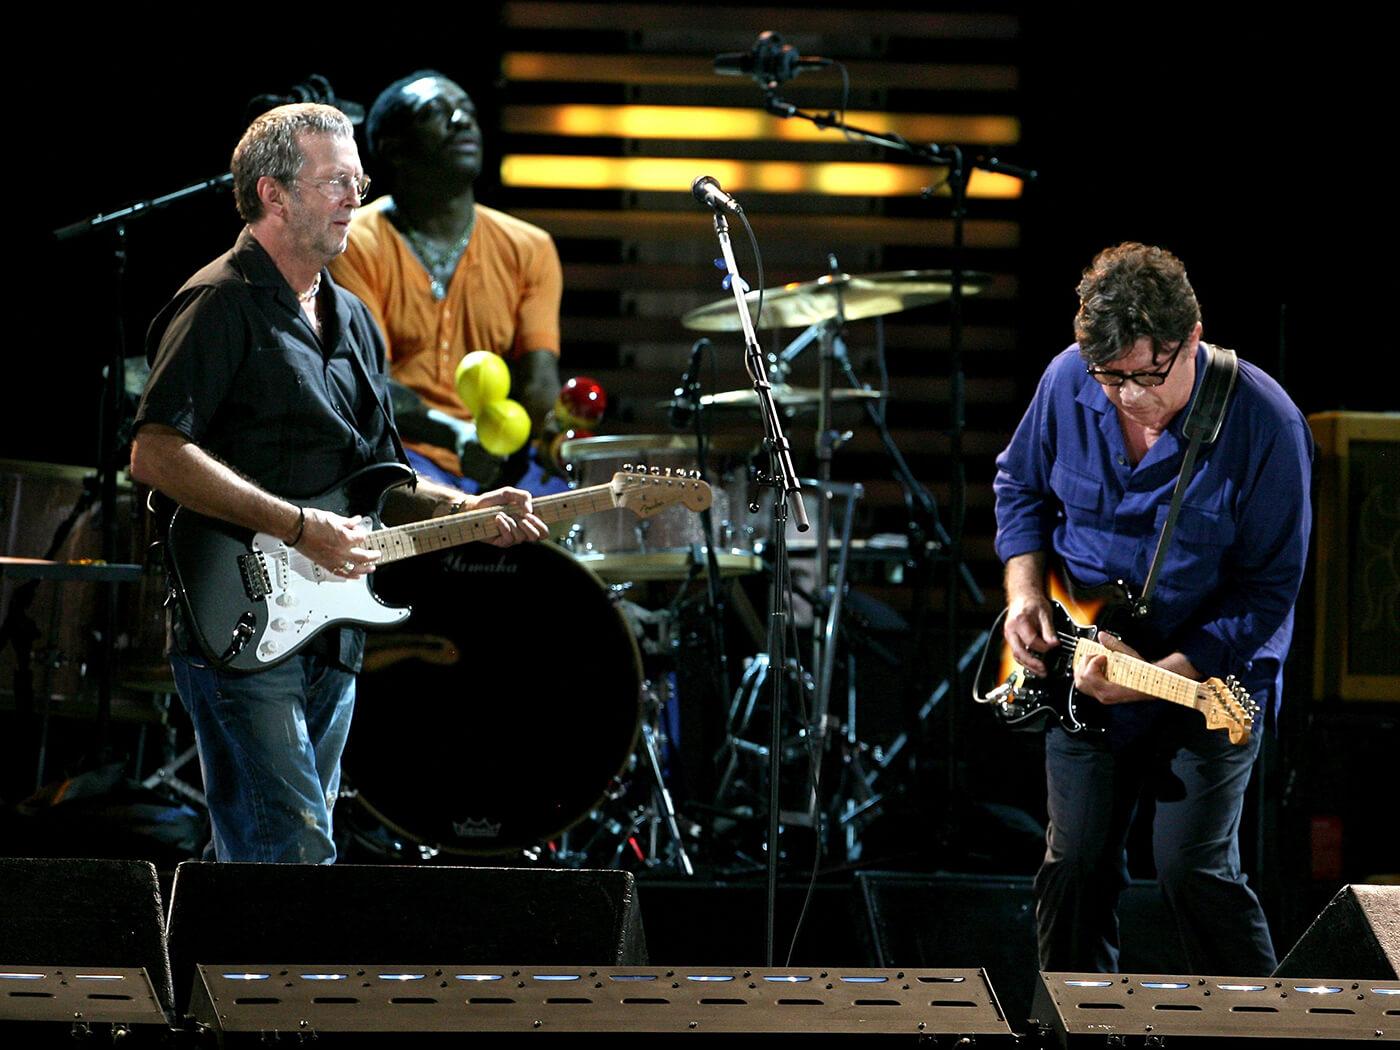 Robbie Robertson with Eric Clapton and Steve Jordan